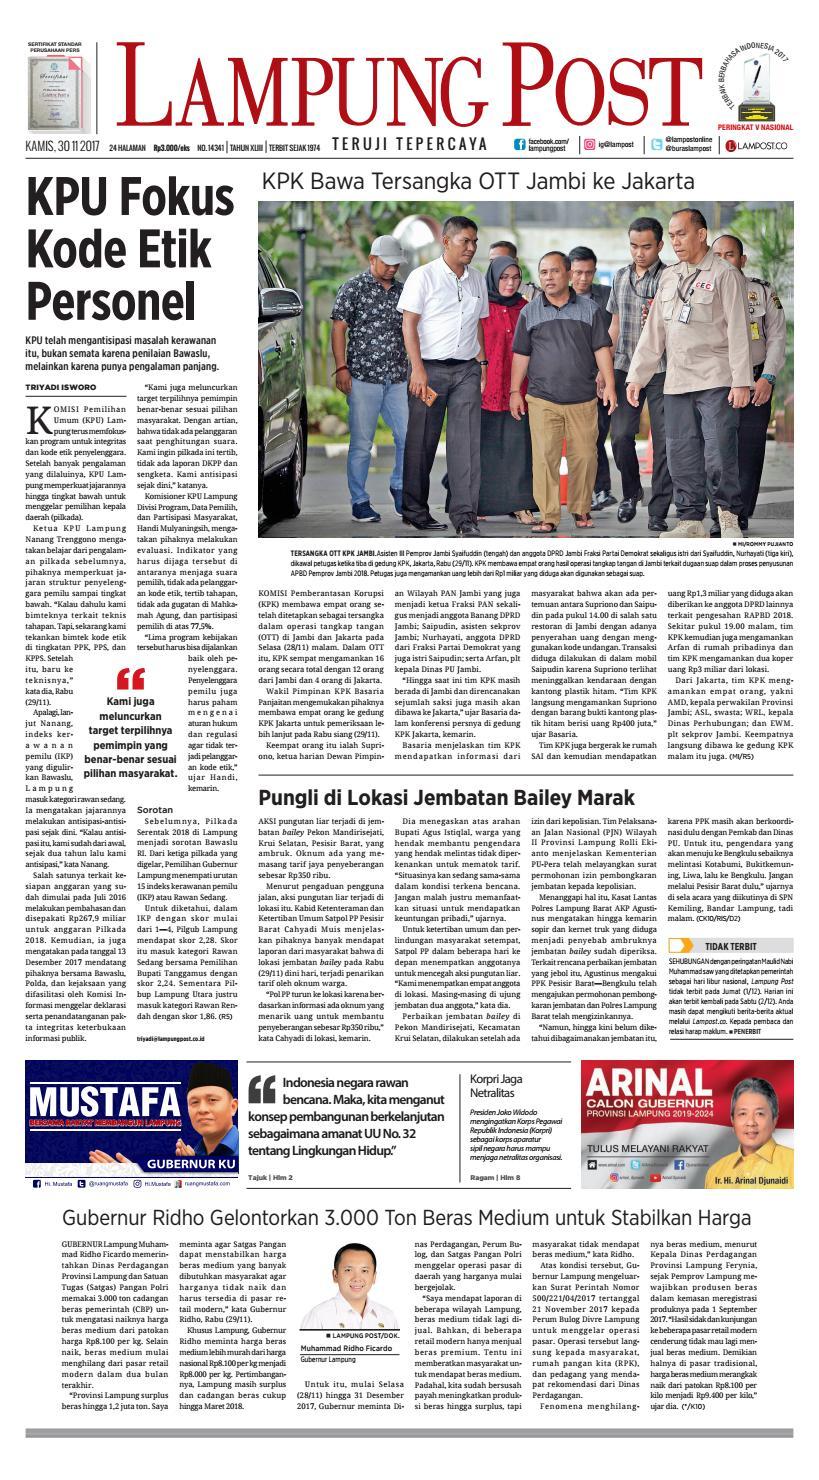 Lampung Post Kamis 30 November 2017 By Issuu Weber Keranjang Ikan Besar